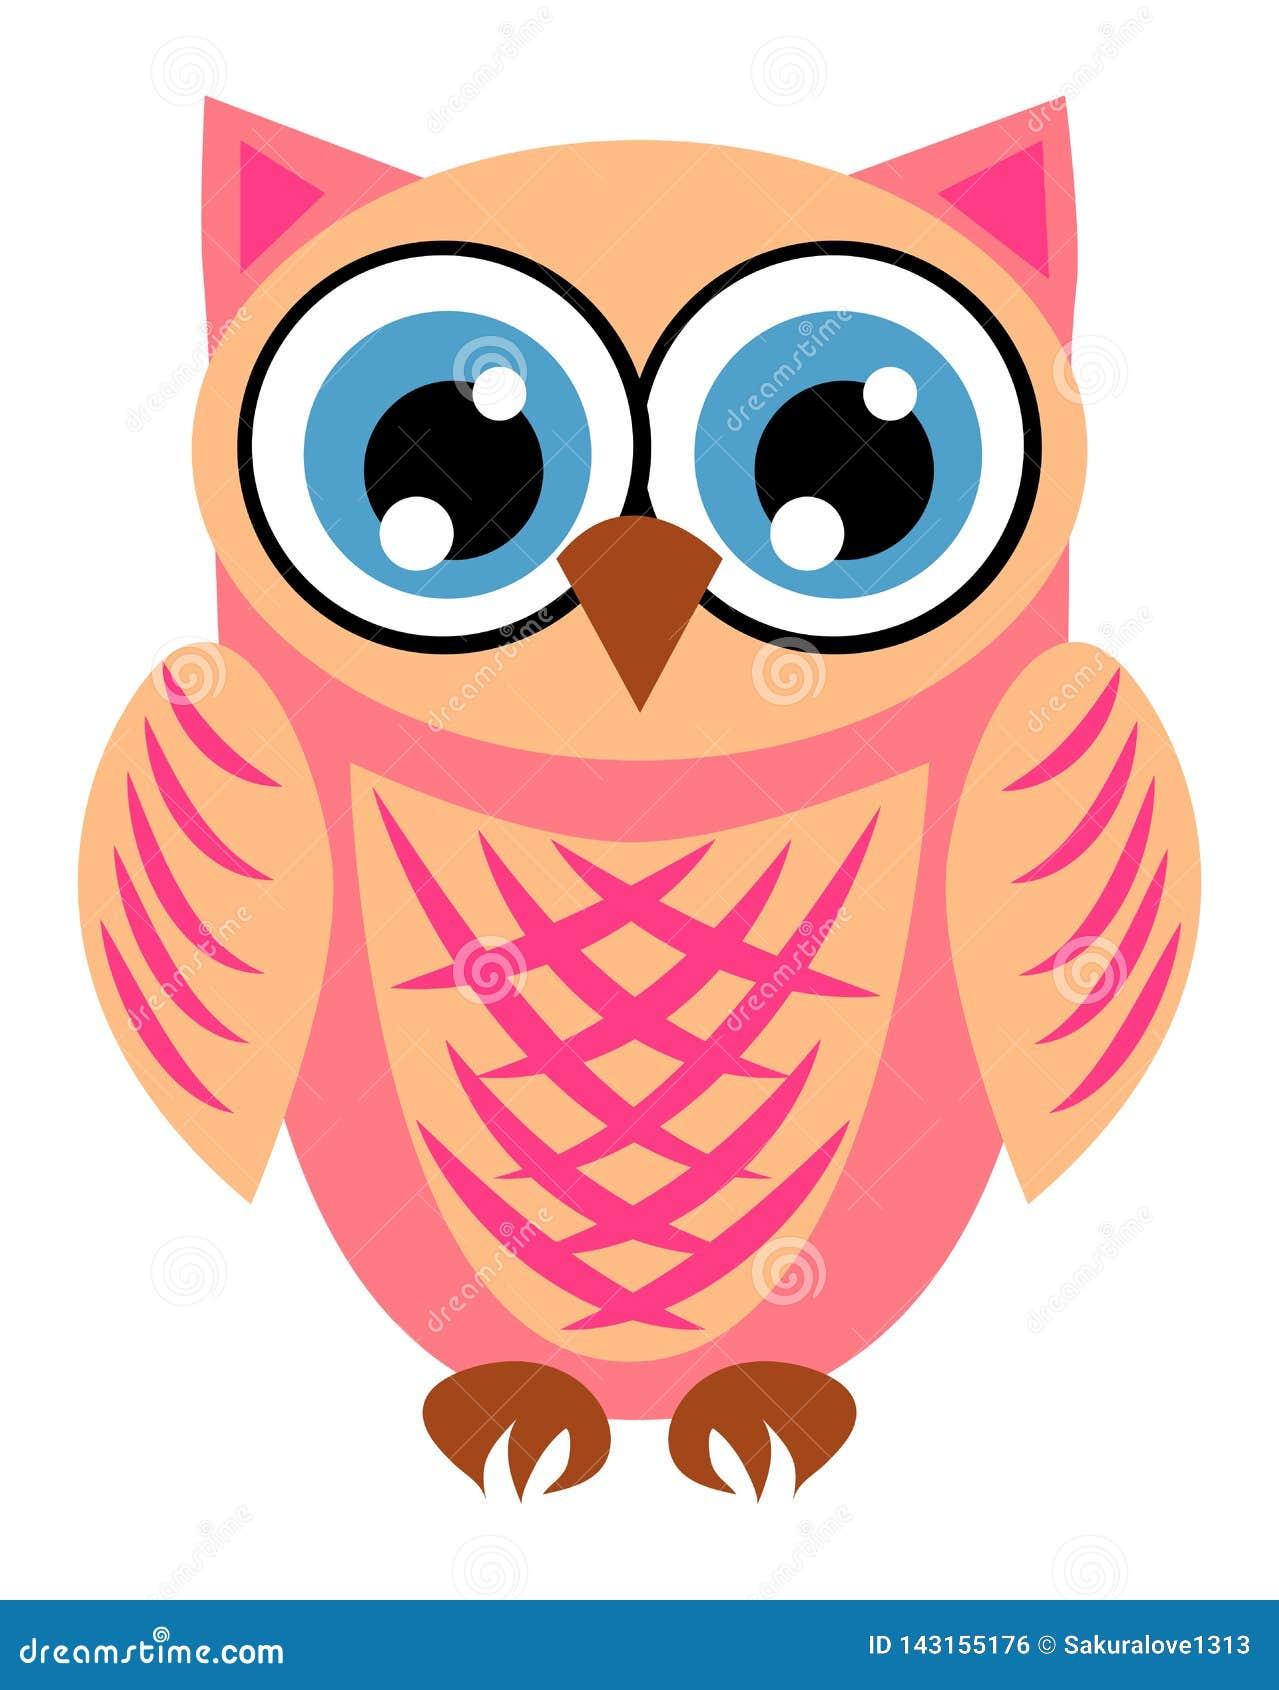 Awe Inspiring Cute Girl Owls Baby Showers Parties For Baby Girls Stock Interior Design Ideas Skatsoteloinfo